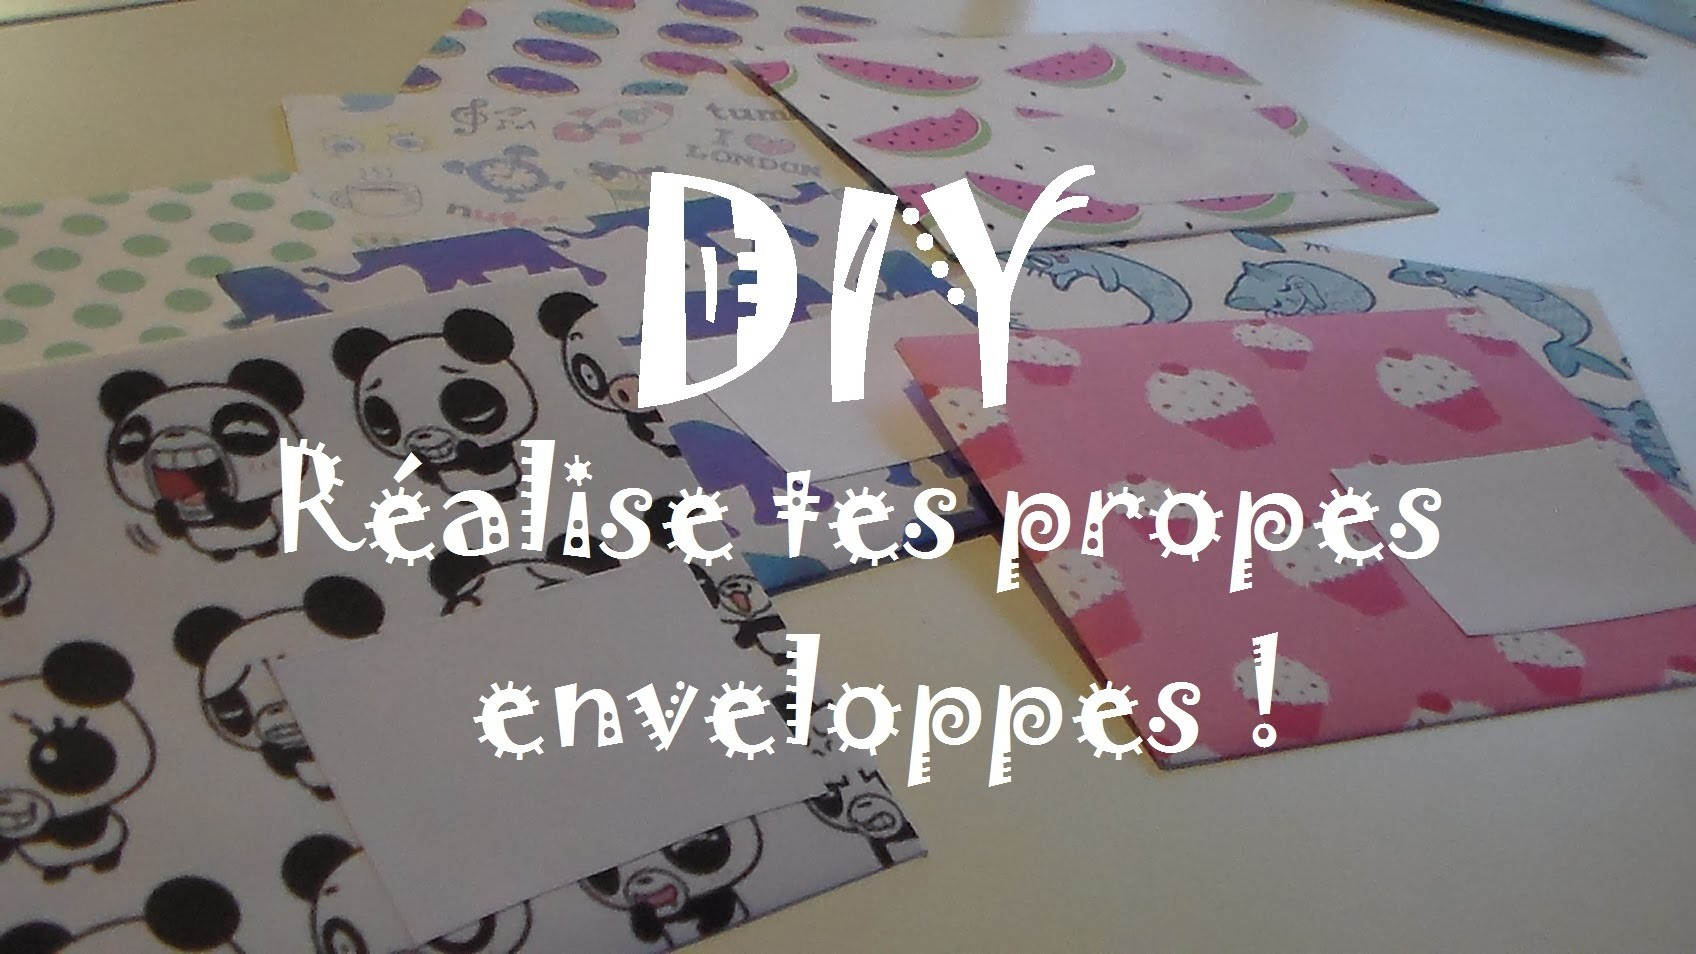 [DIY n°1] Réalise tes propres enveloppes ♥